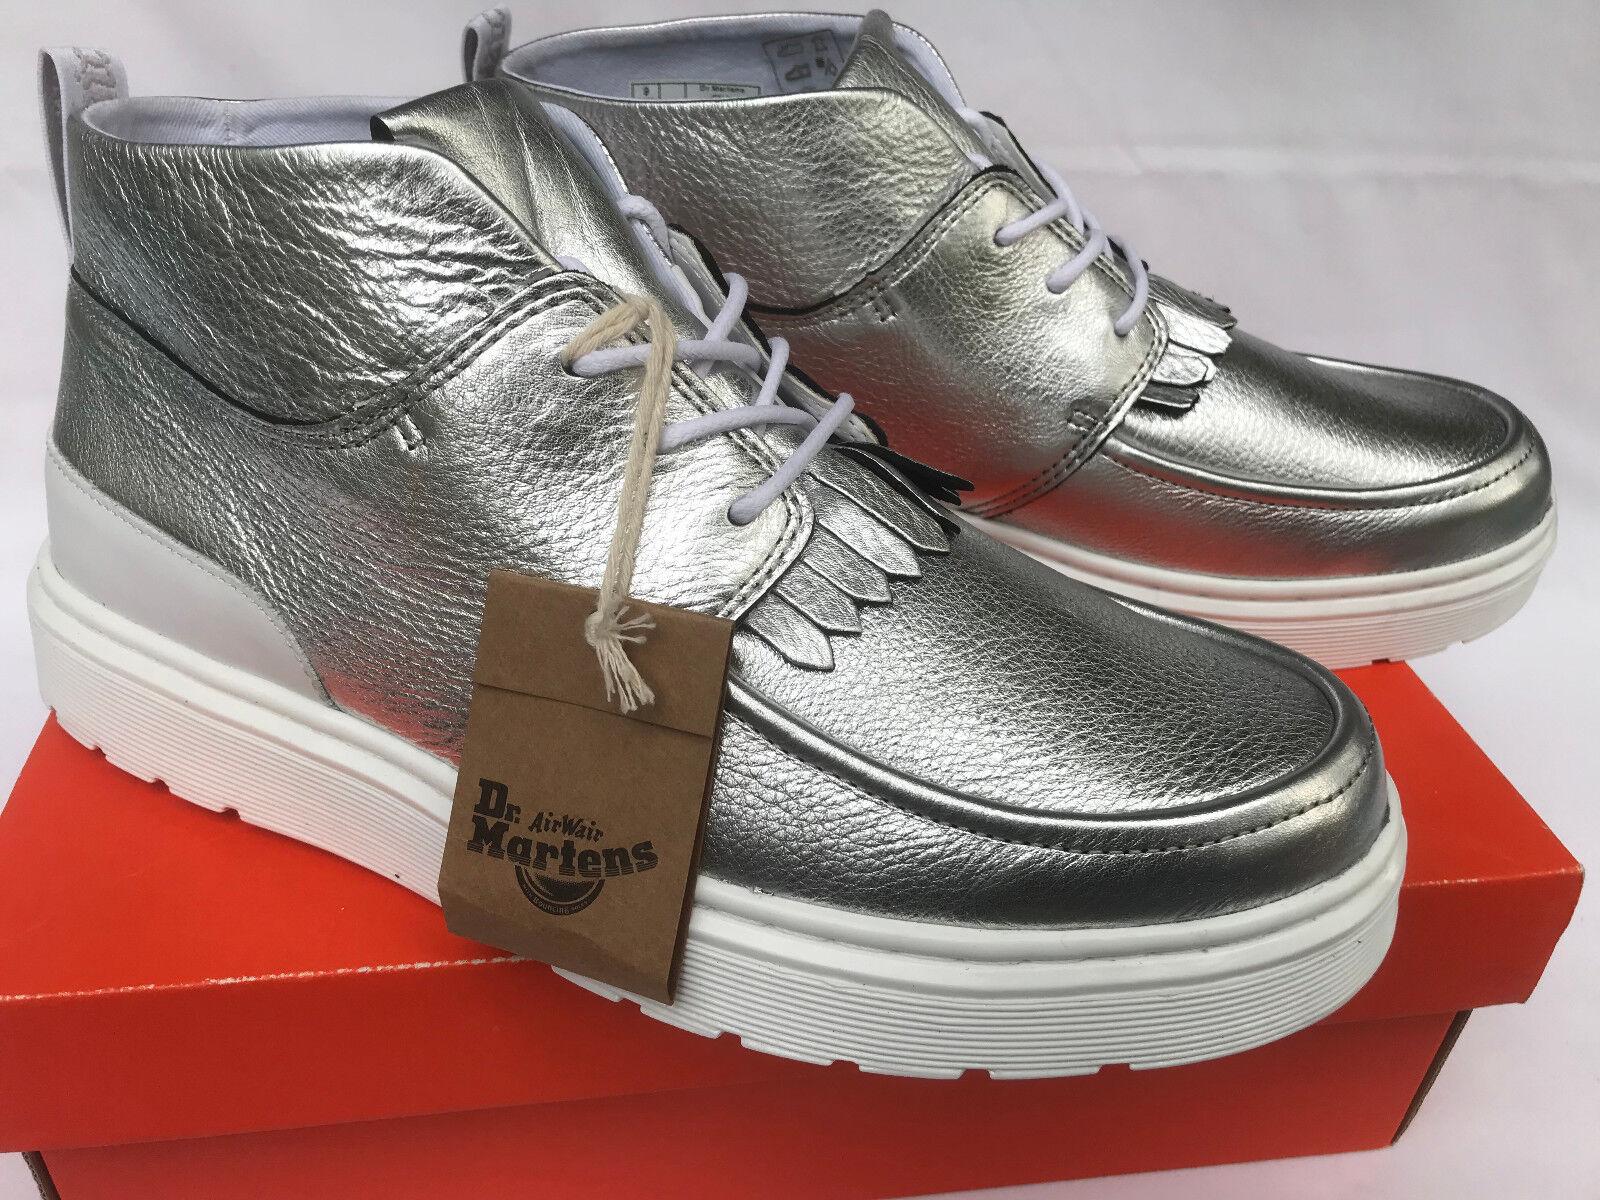 Dr. Martens Jemima Kiltie Chukka Mid Silver Leather Moc Boots shoes Women's 7